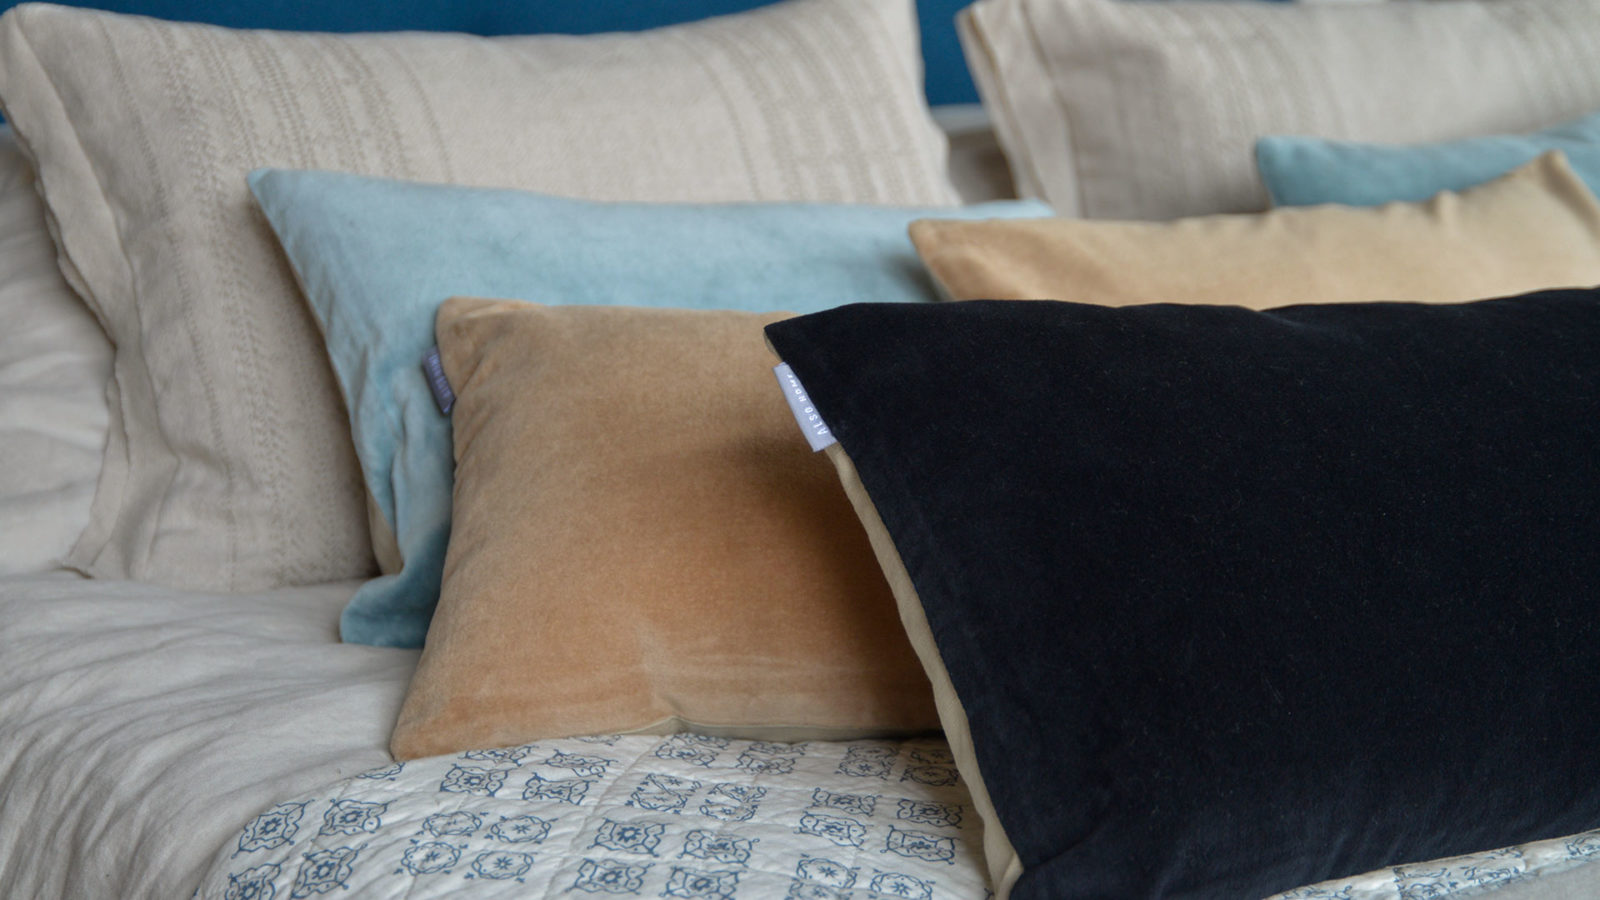 velvet-cushions-black-caramel-and-aqua